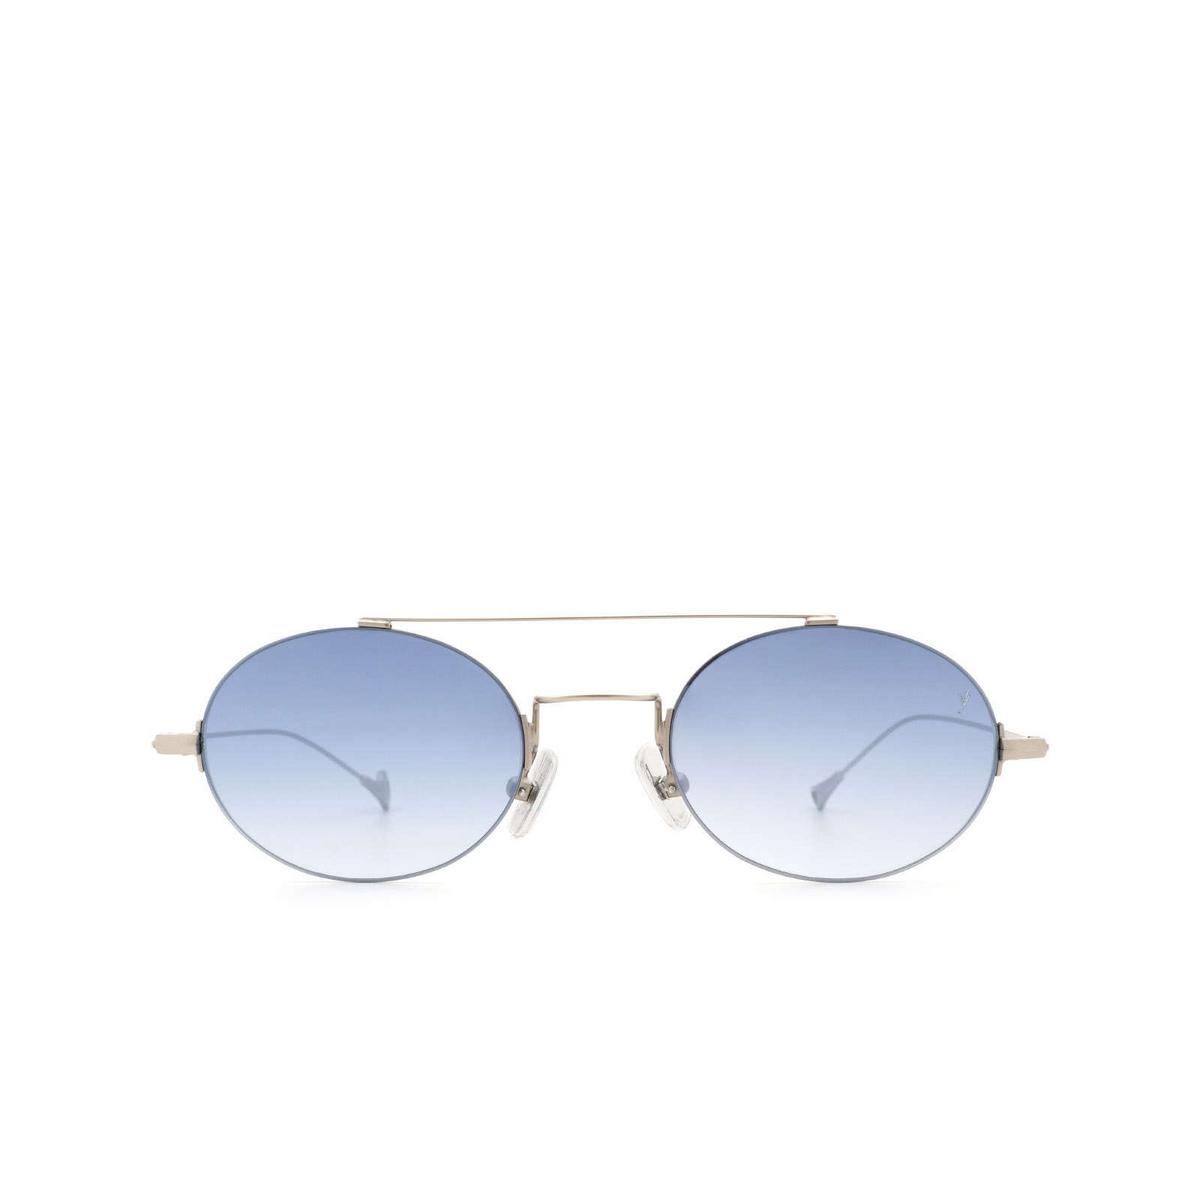 Eyepetizer® Oval Sunglasses: Celine color Silver Matt C.1-26F - front view.